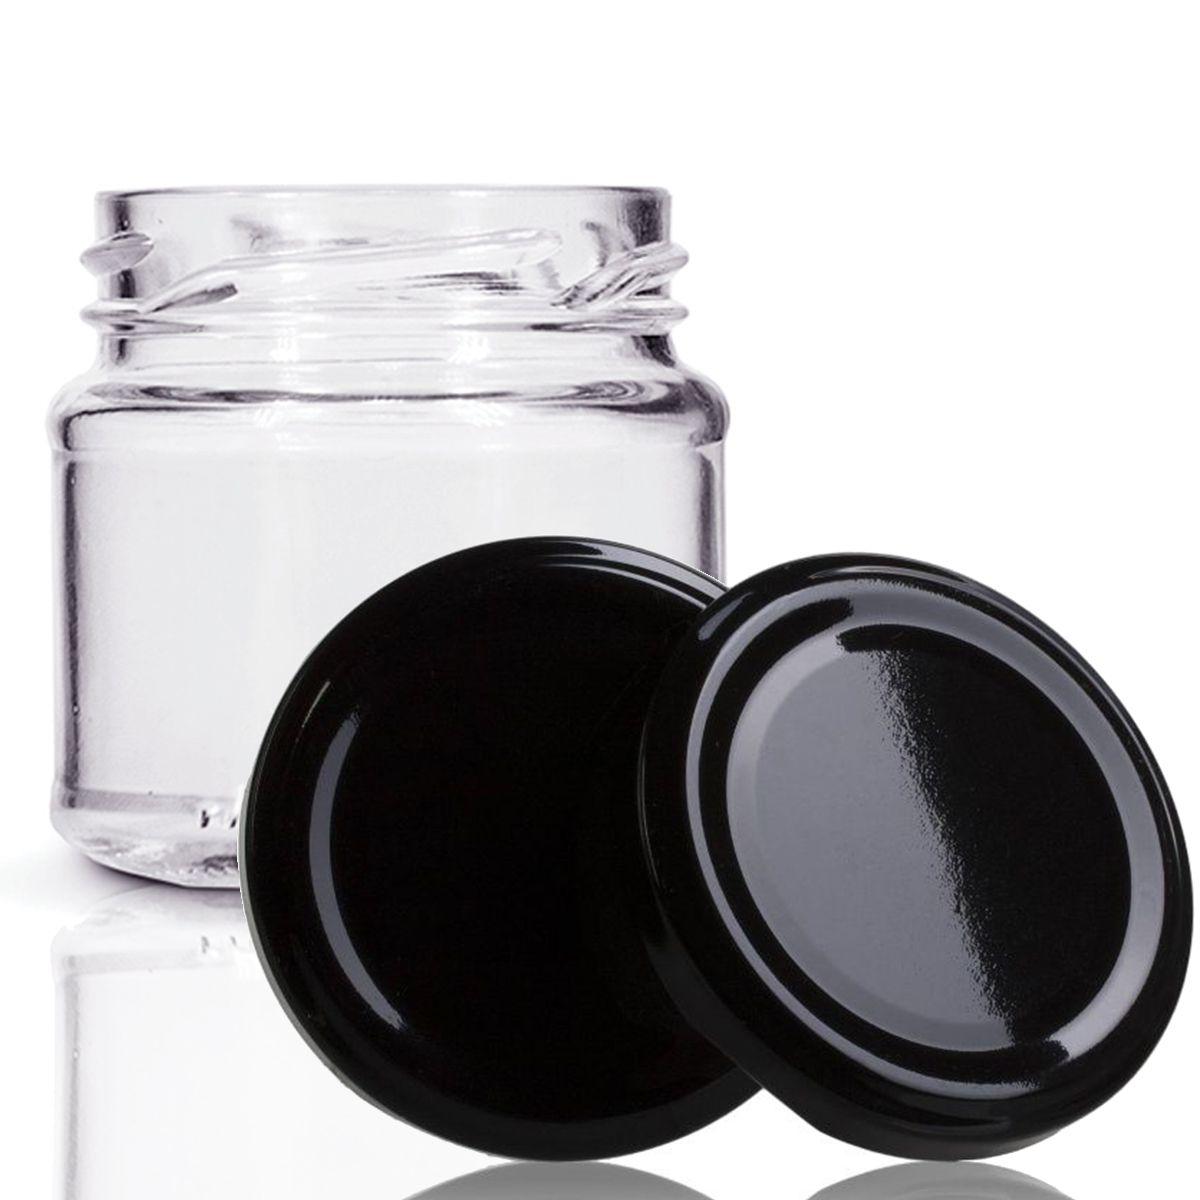 24 Potes De Vidro Mini Belém 150 Ml Tampa Preta + Lacre  - EMPÓRIO PACK